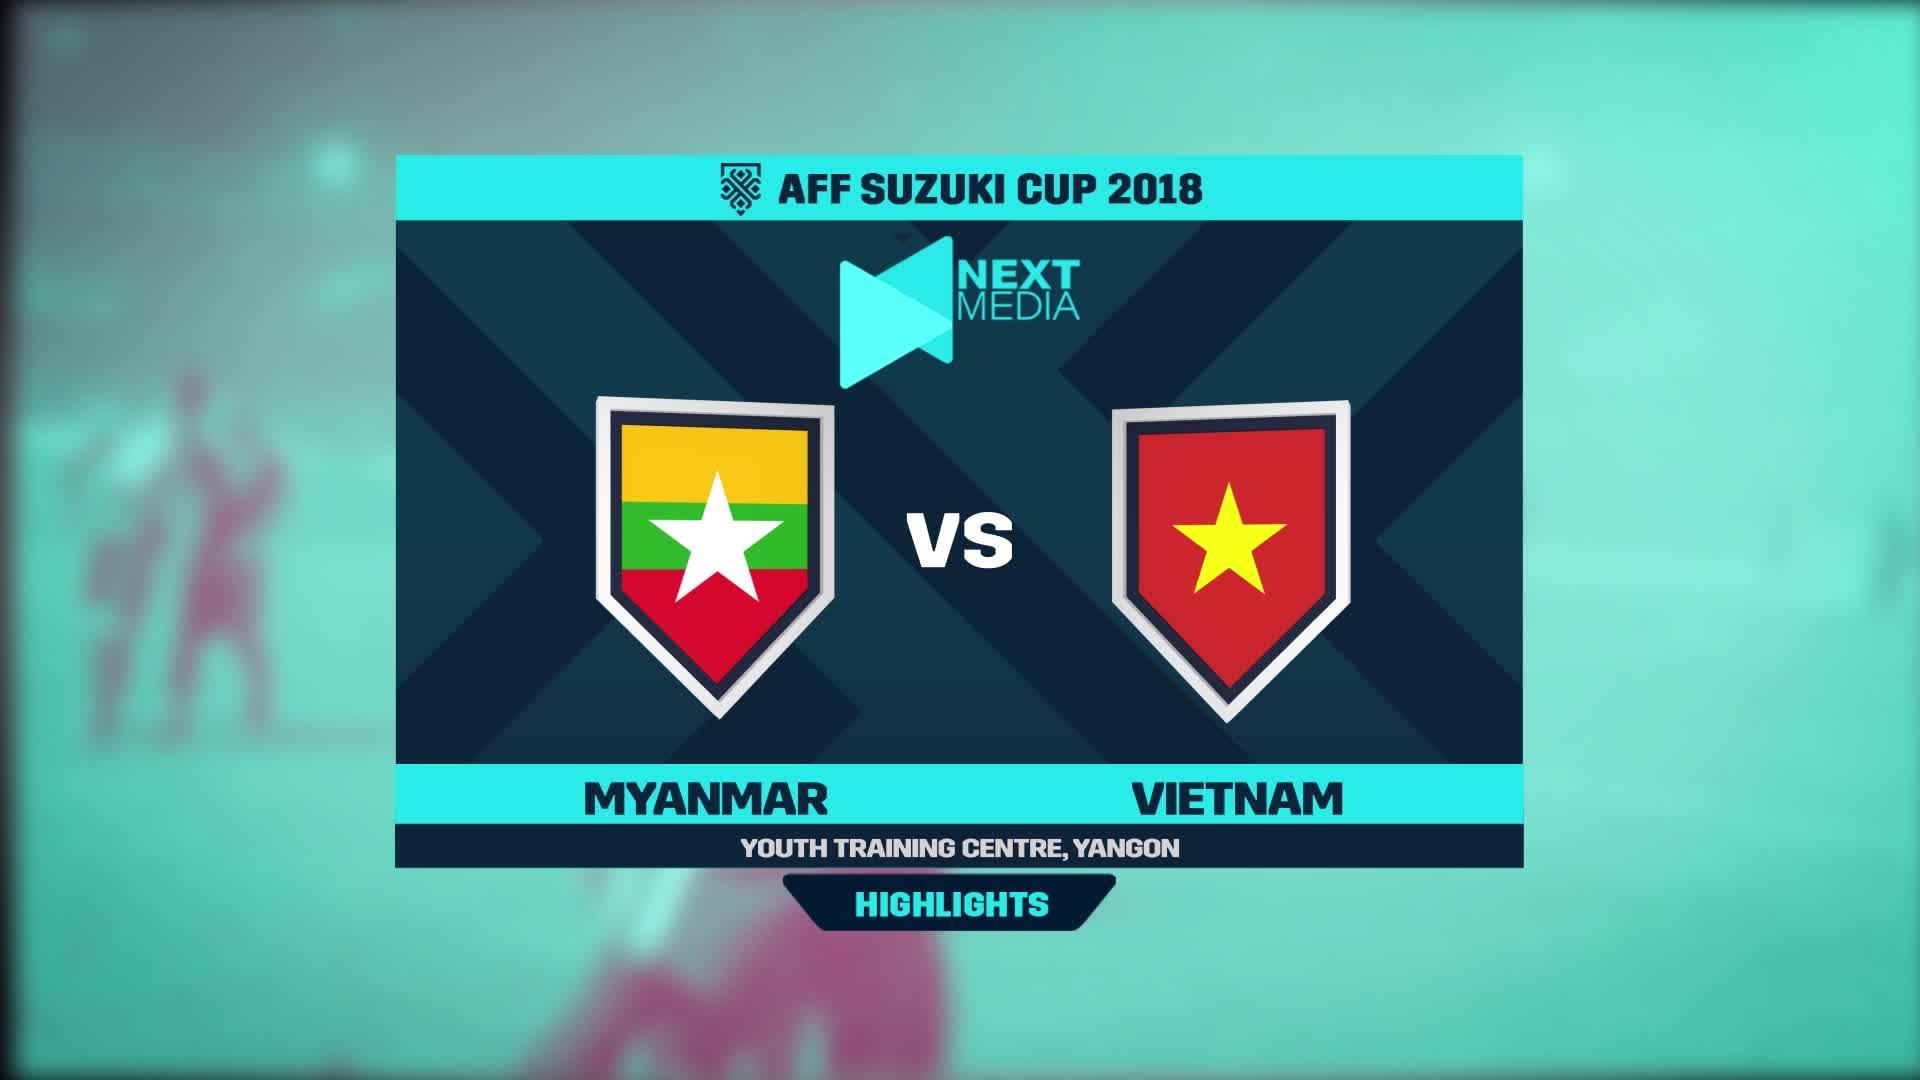 myanmar-0-0-viet-nam-highlights-bang-a-aff-cup-2018-1542720712432894679097-5f81d.jpg